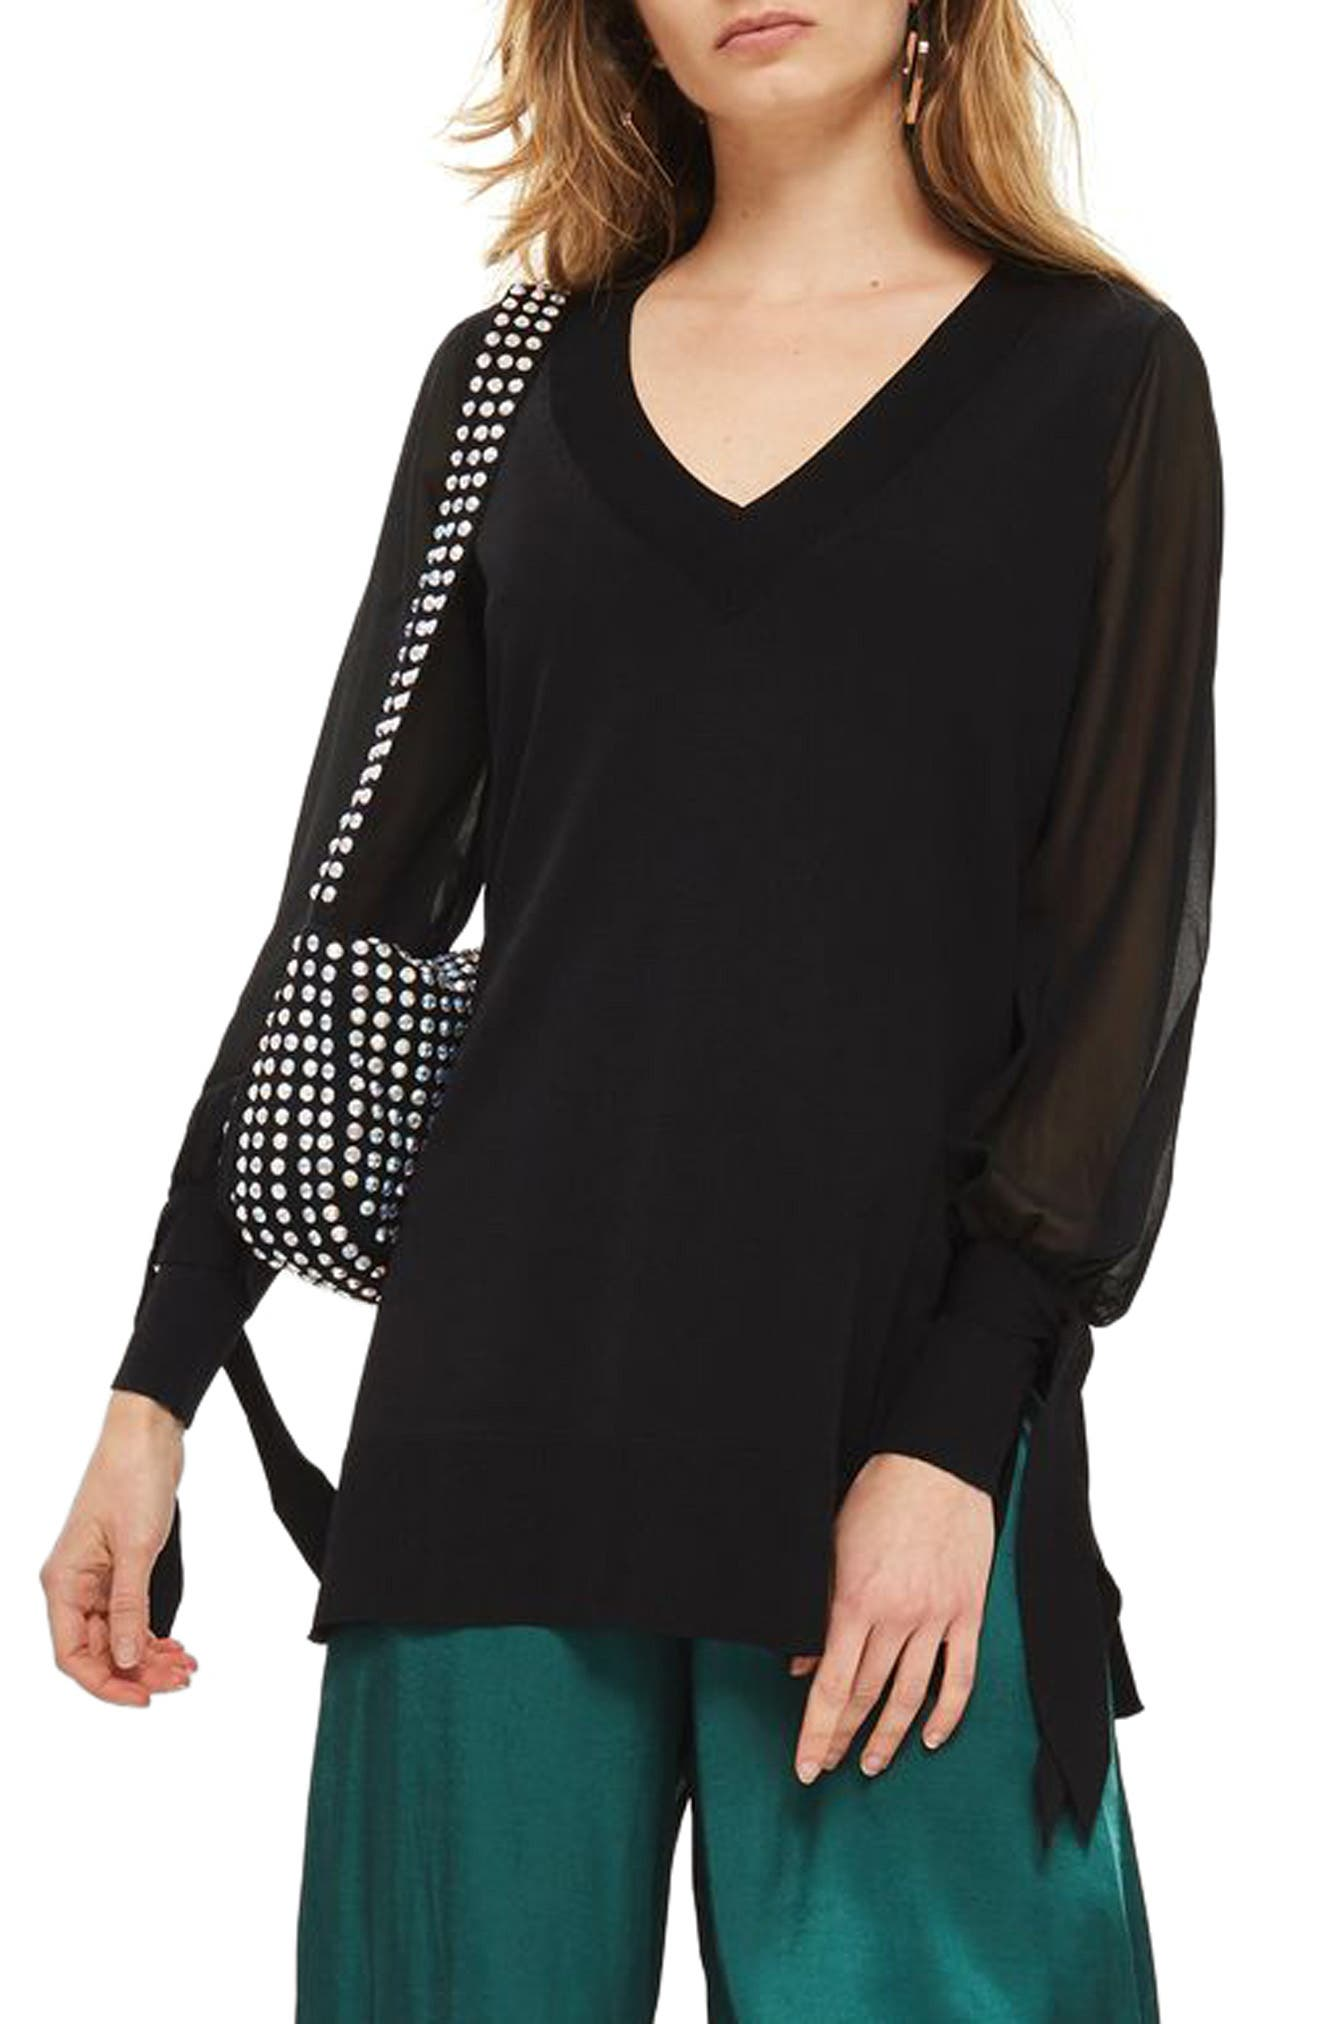 Topshop Chiffon Sleeve Longline Sweater